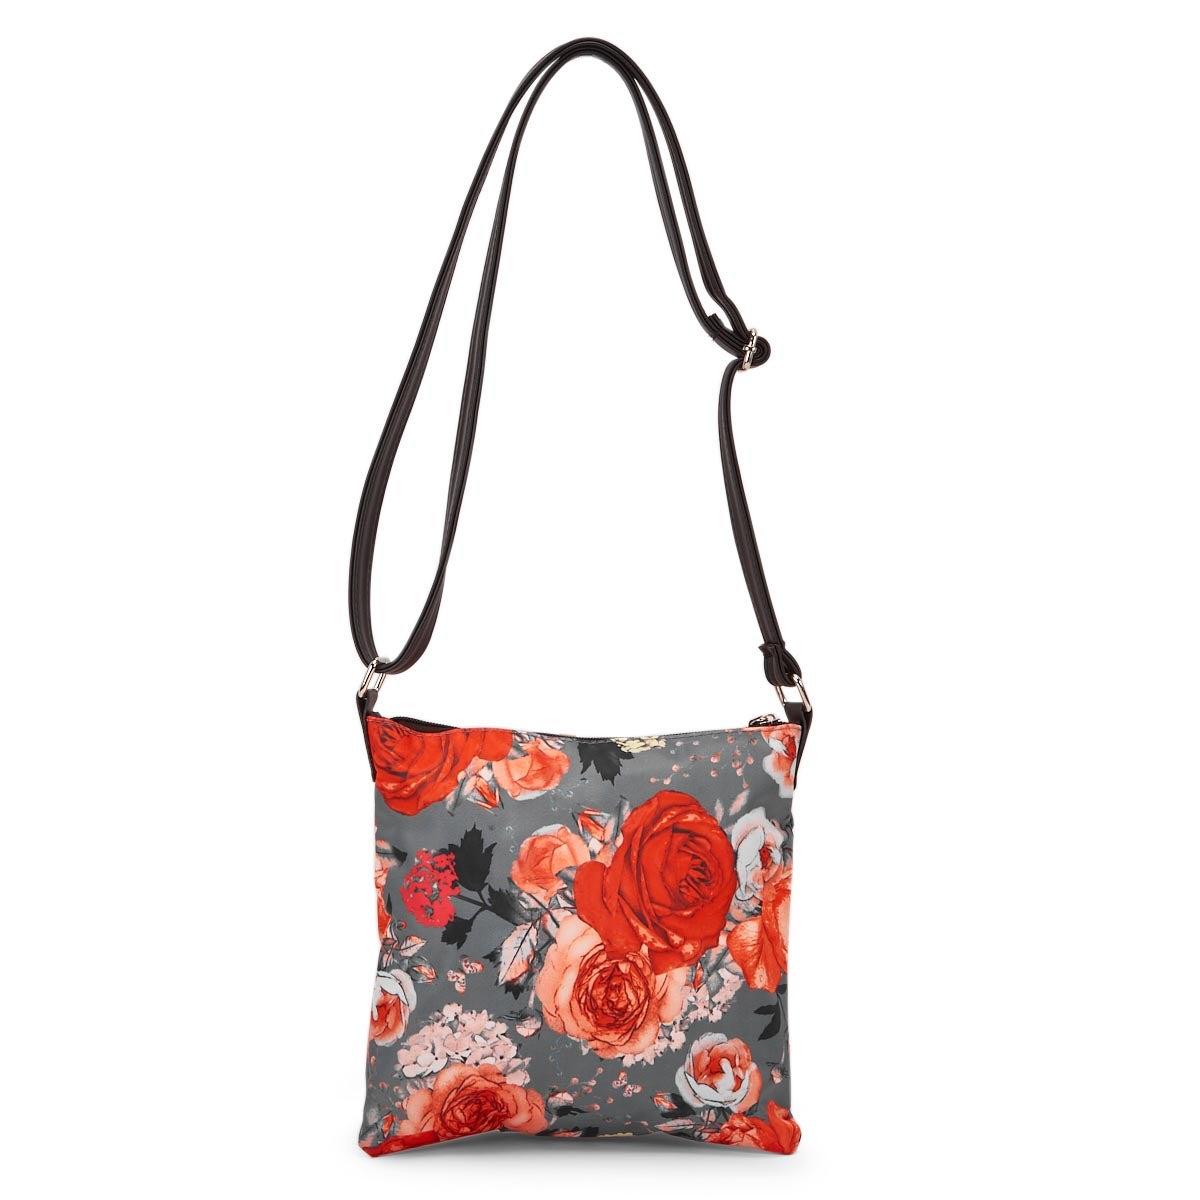 Lds grey/orng flower cross body bag